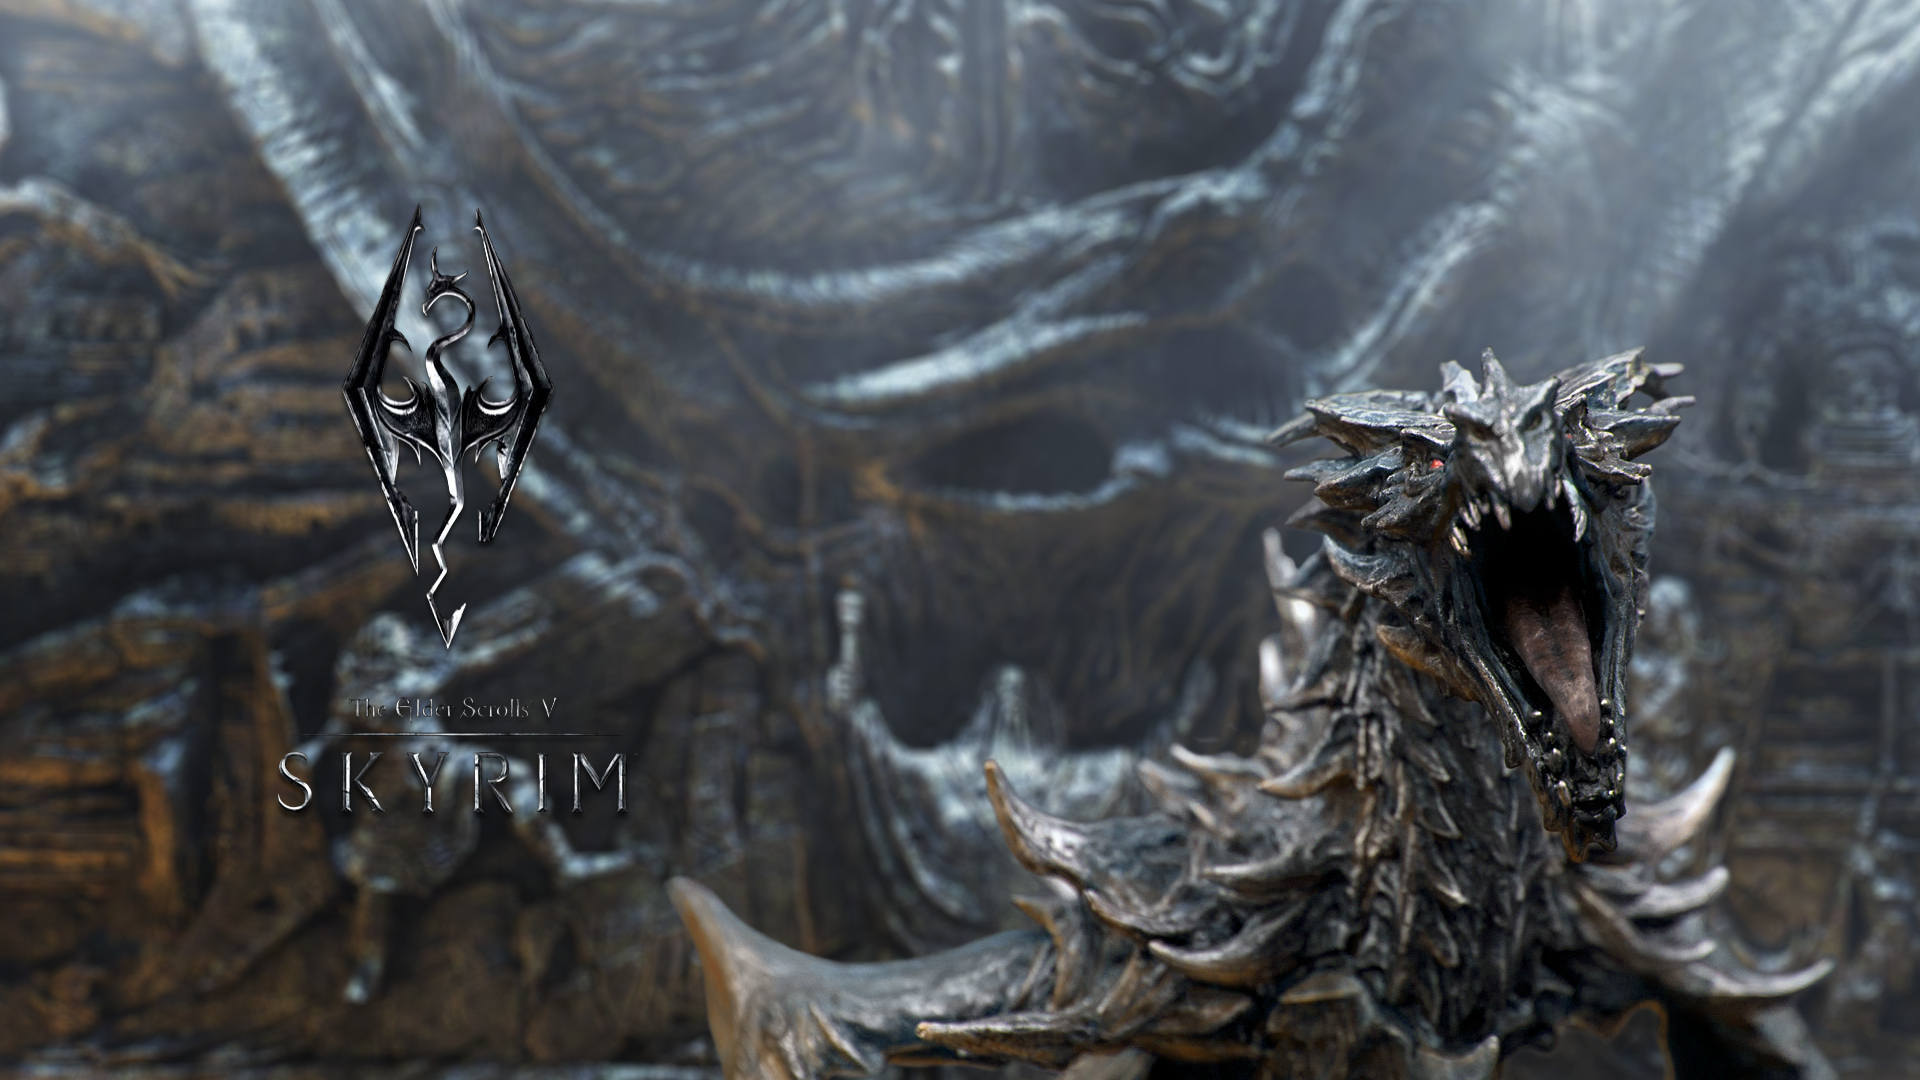 Skyrim Dragon: Skyrim Off The Record - An Elder Scrolls